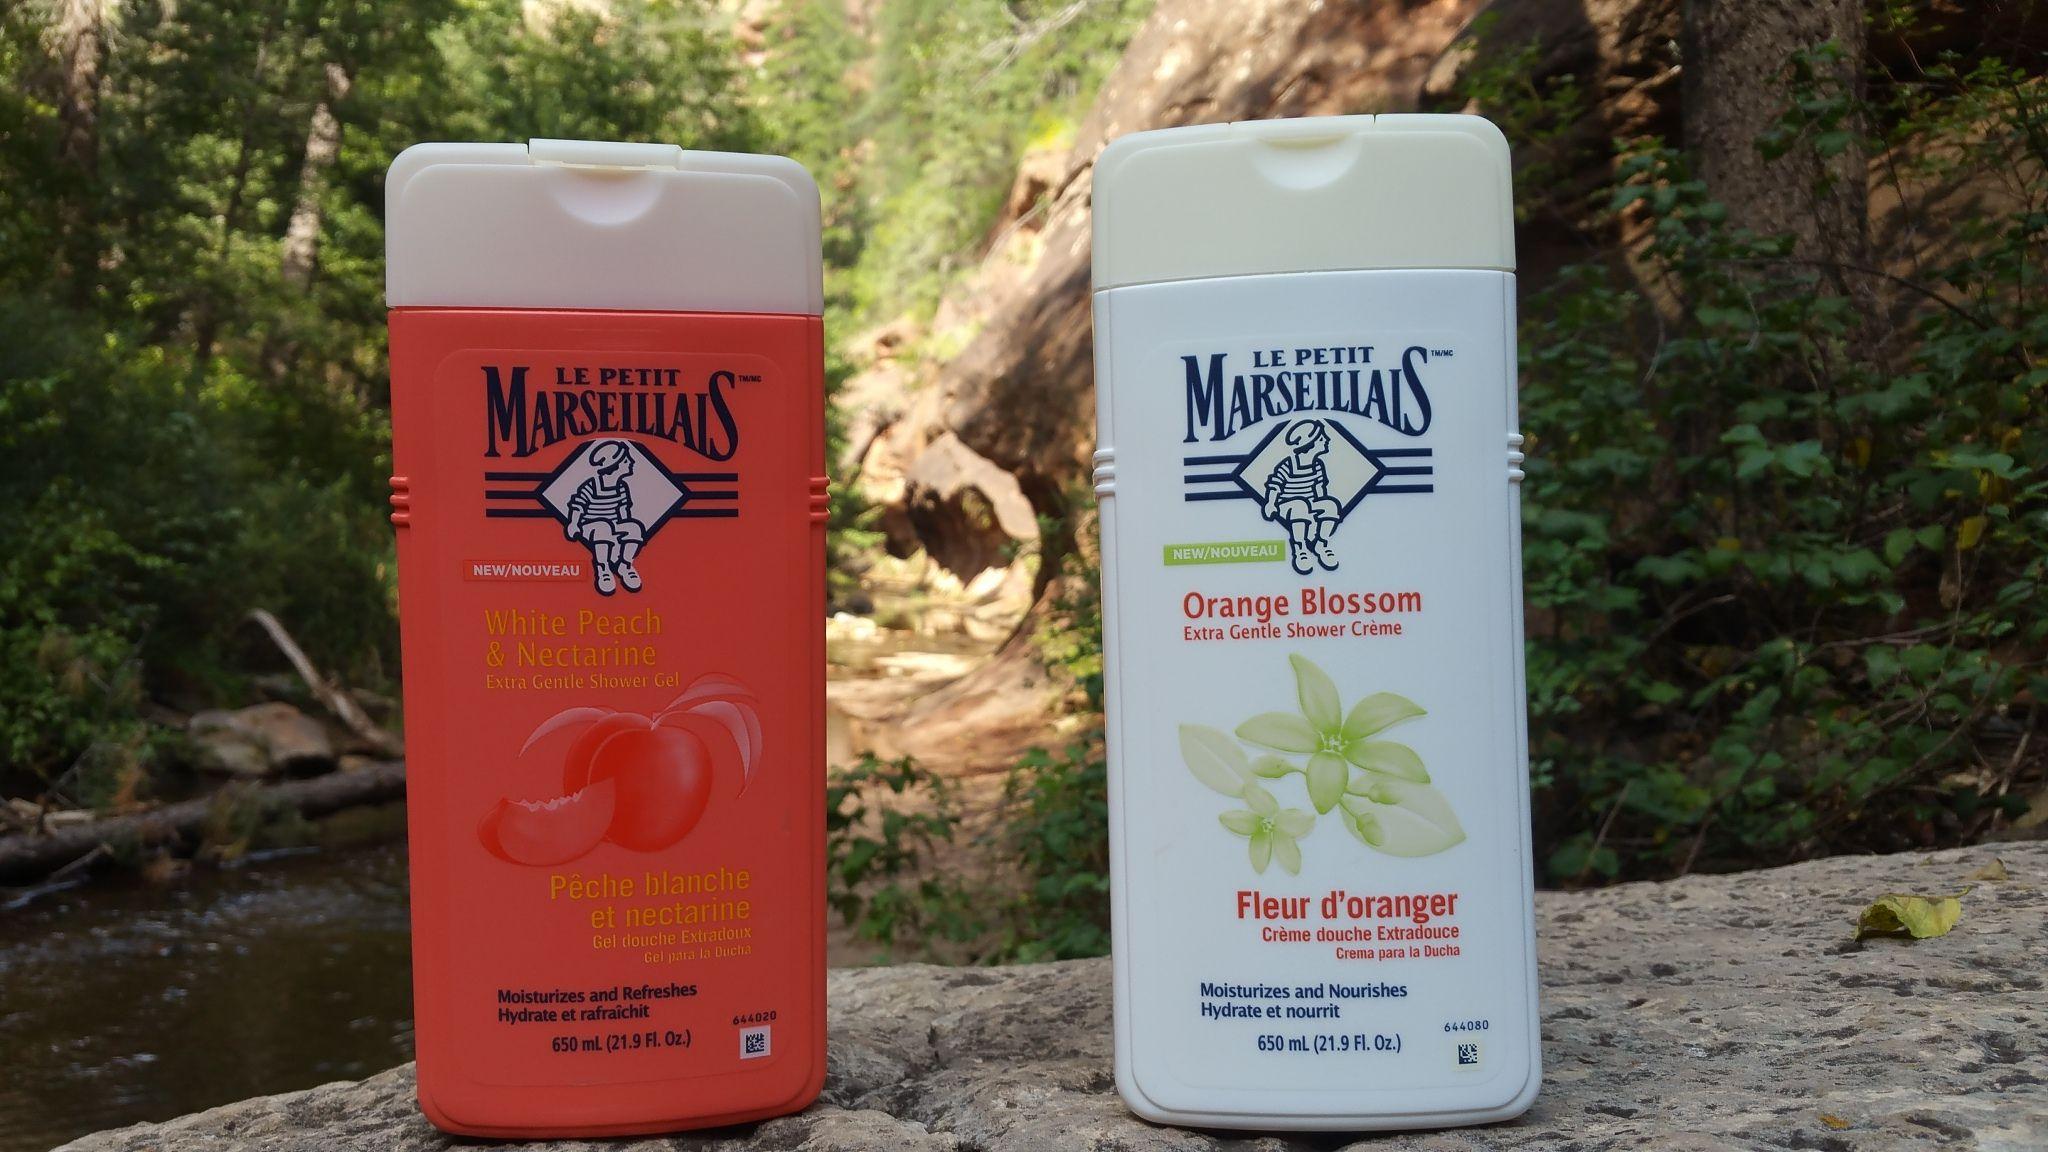 Le petit marseillais body wash body wash shampoo